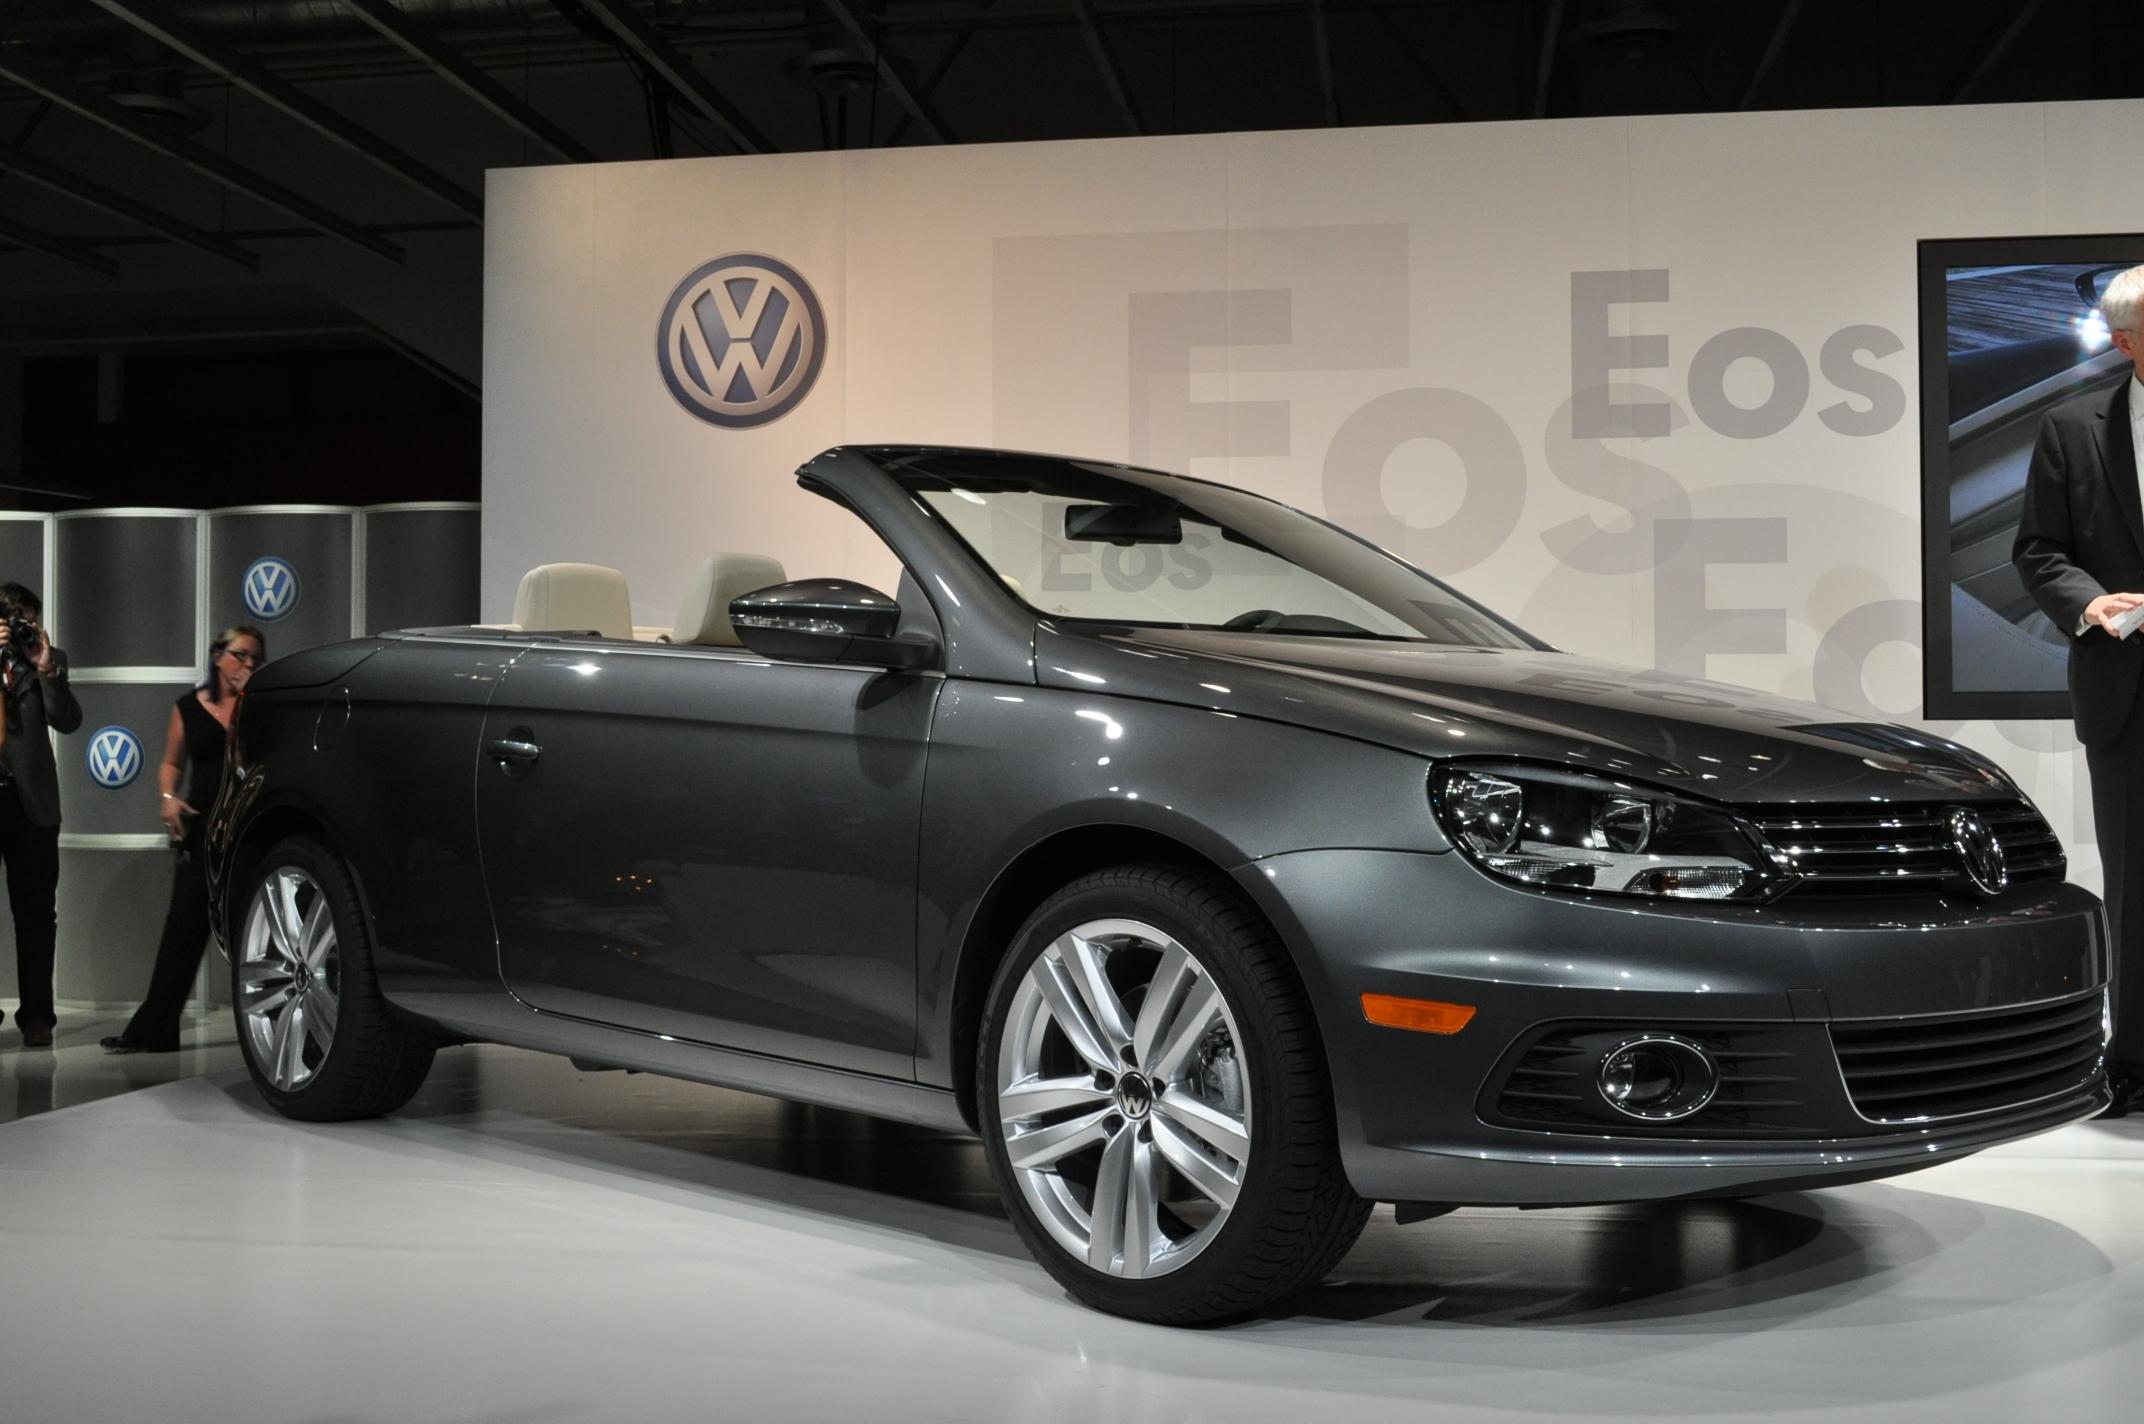 Los Angeles Auto Show Volkswagen Eos Live Photos - Eos car show